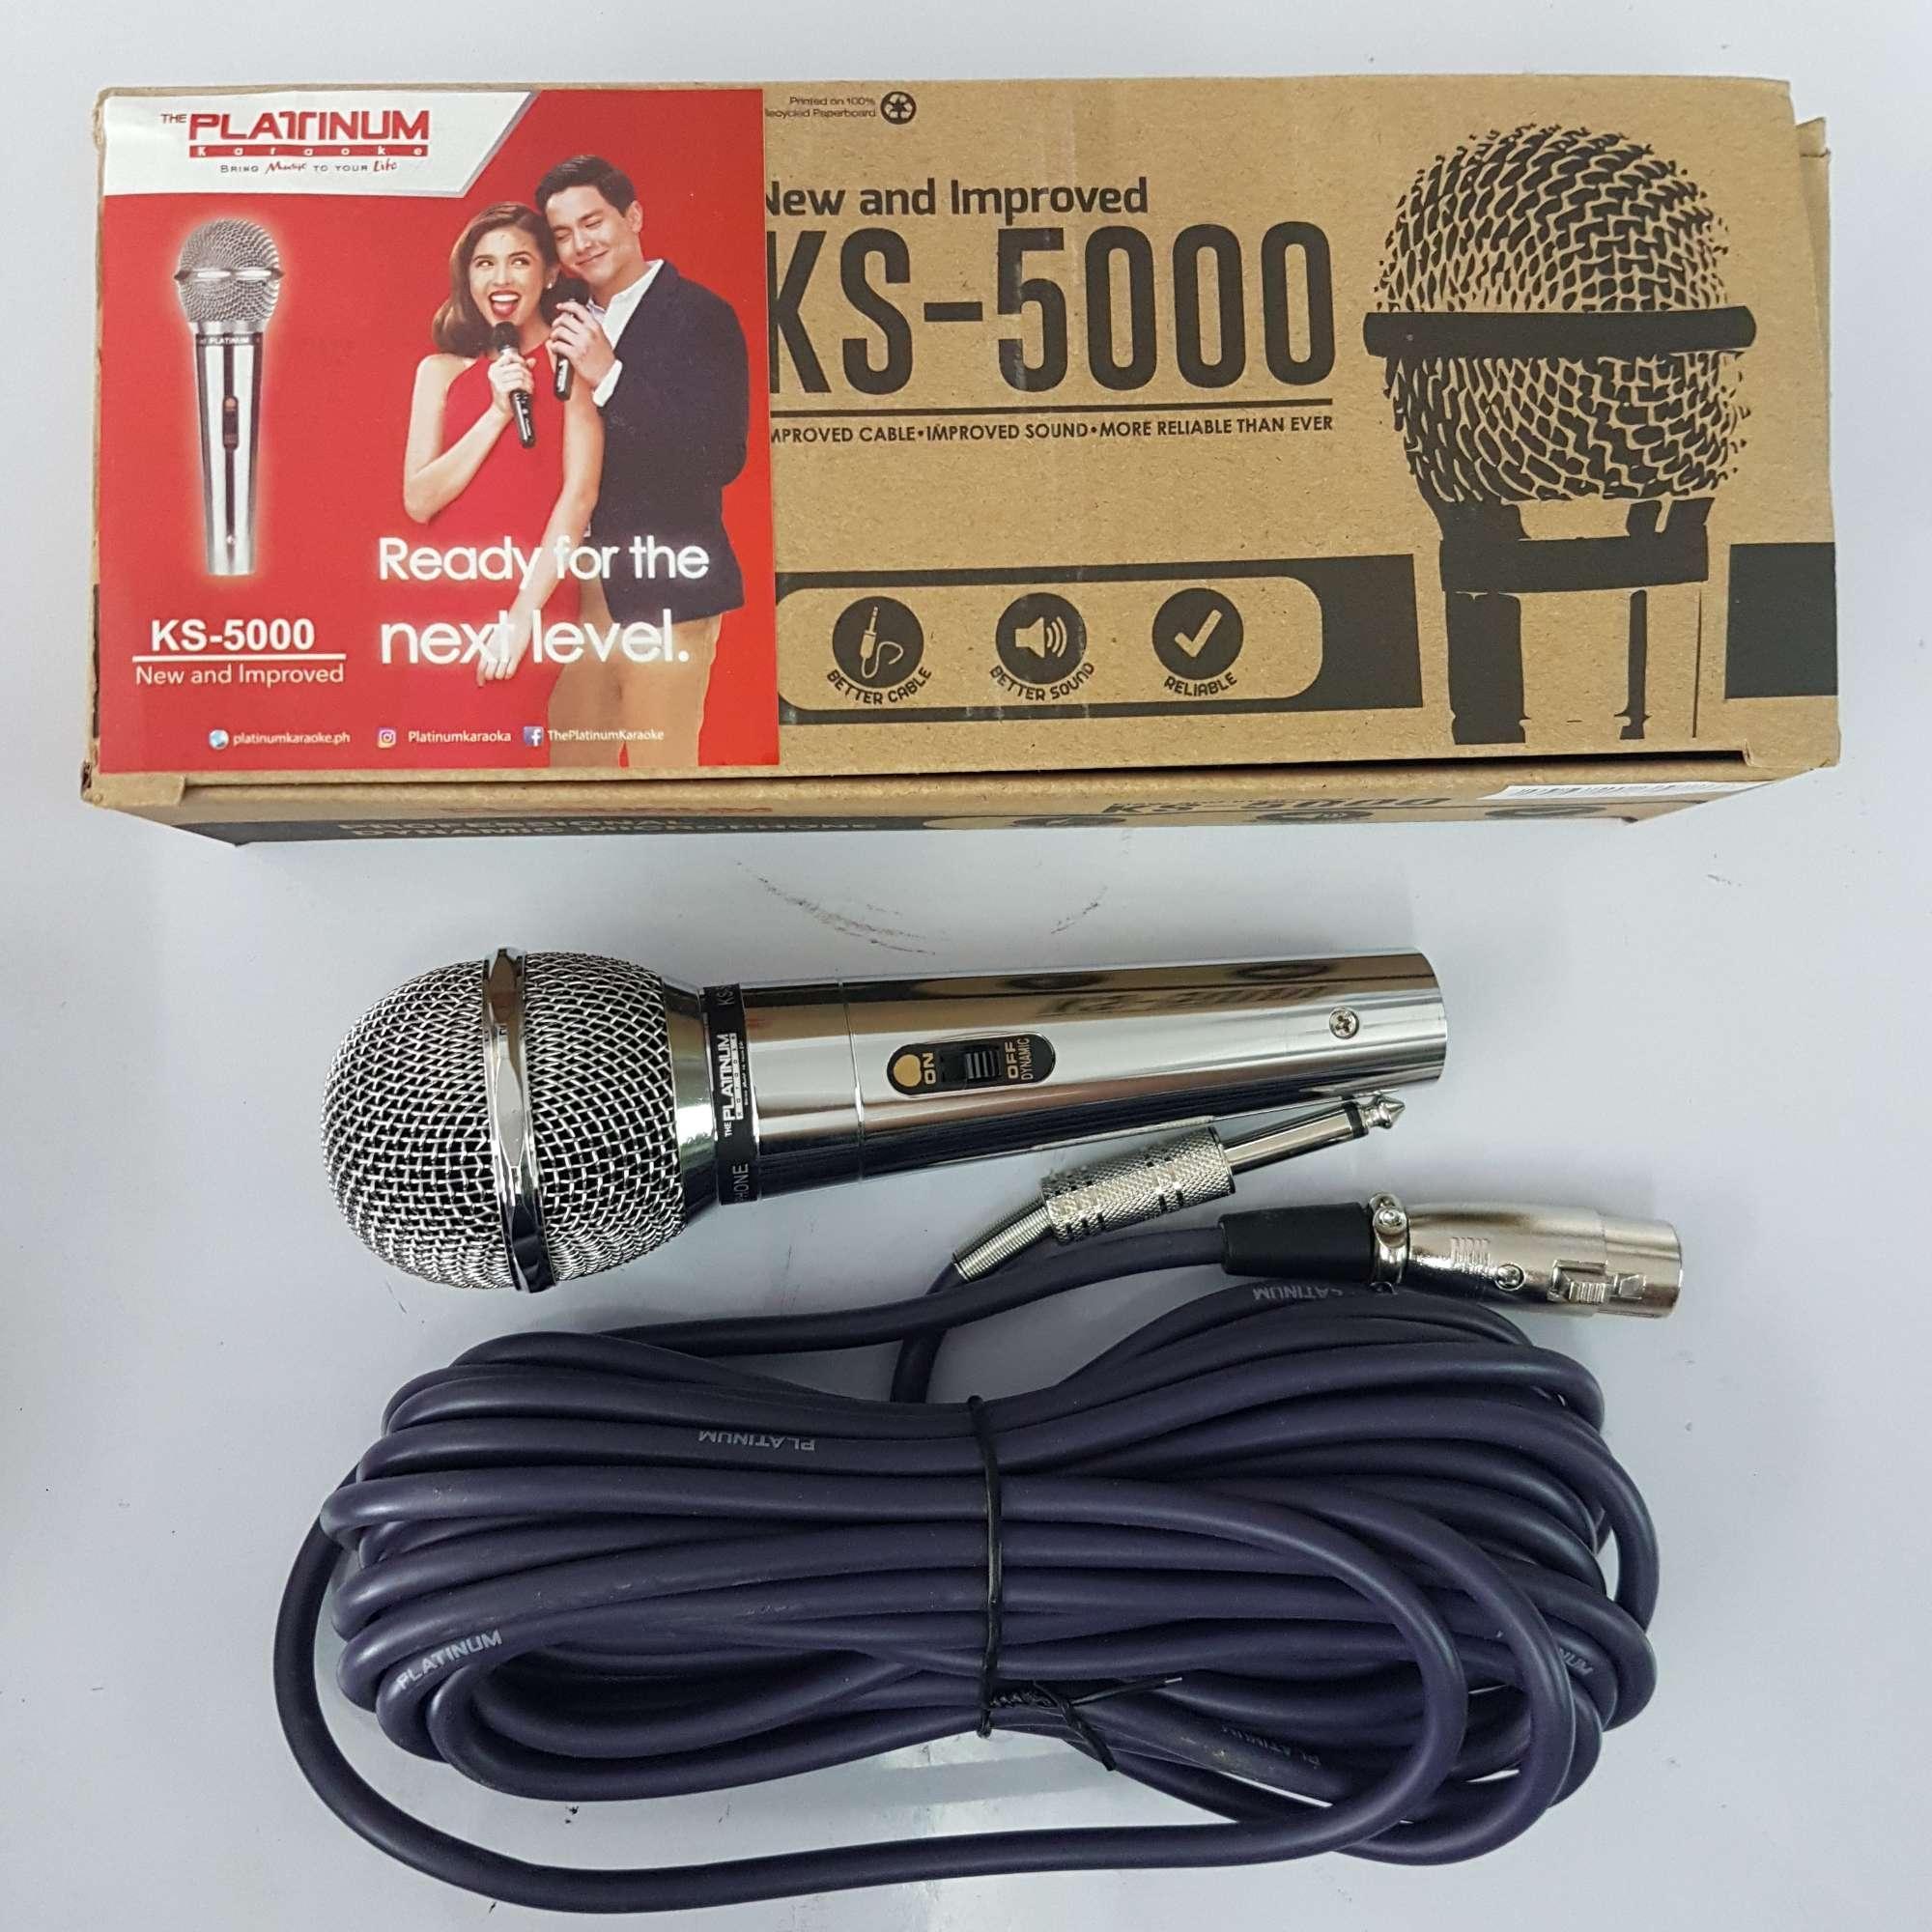 Platinum Wired Microphone W 8m Cord Ks 5000 Philippines Videoke Wiring